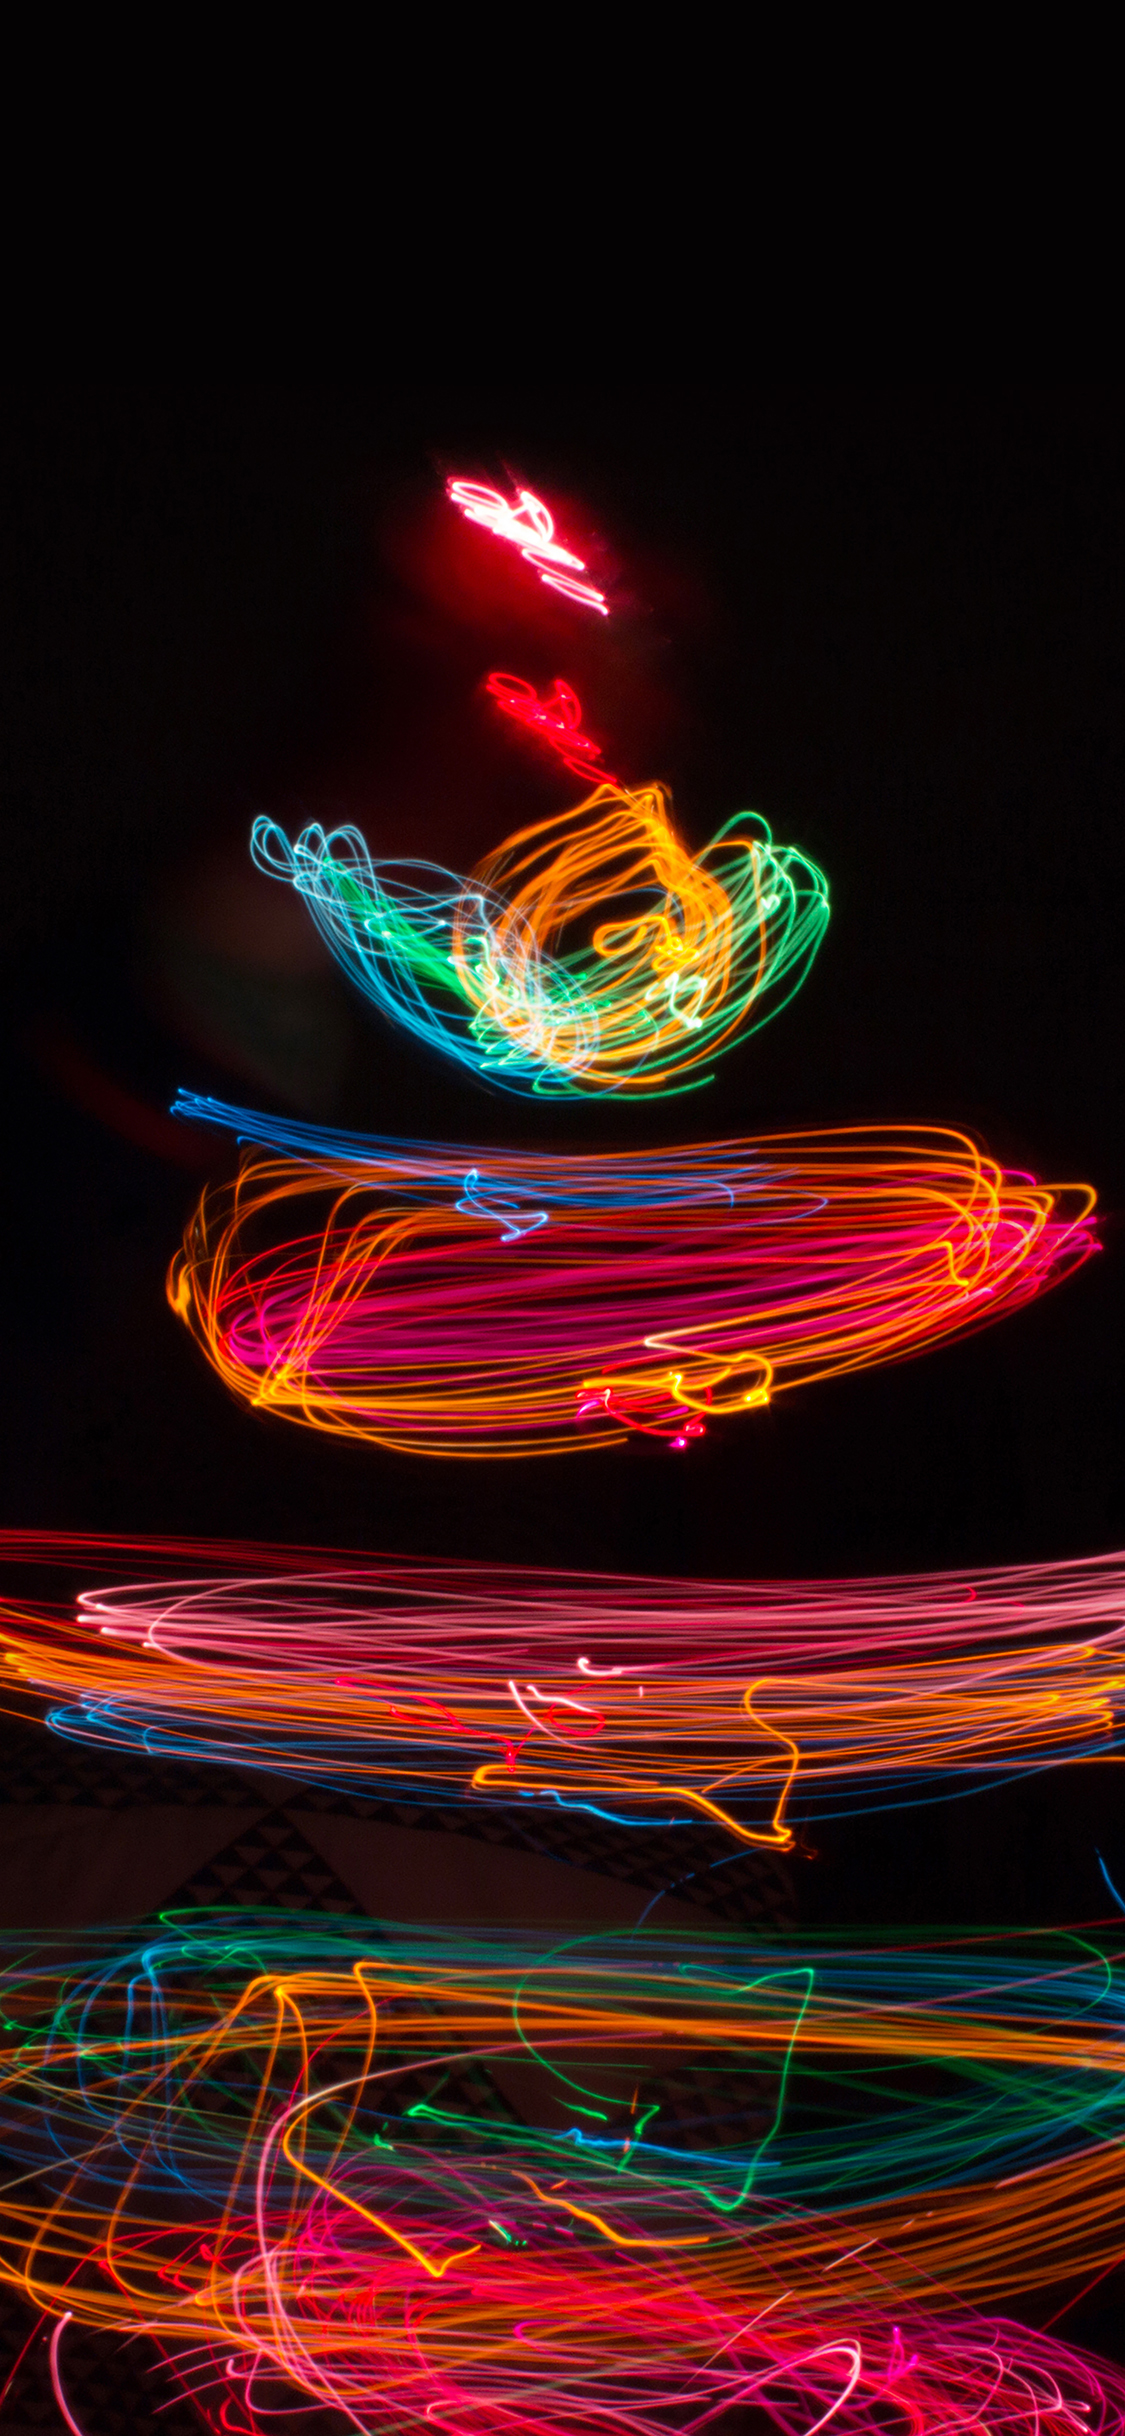 Papers Co Iphone Wallpaper Mj46 Christmas Tree Lights Art Bokeh